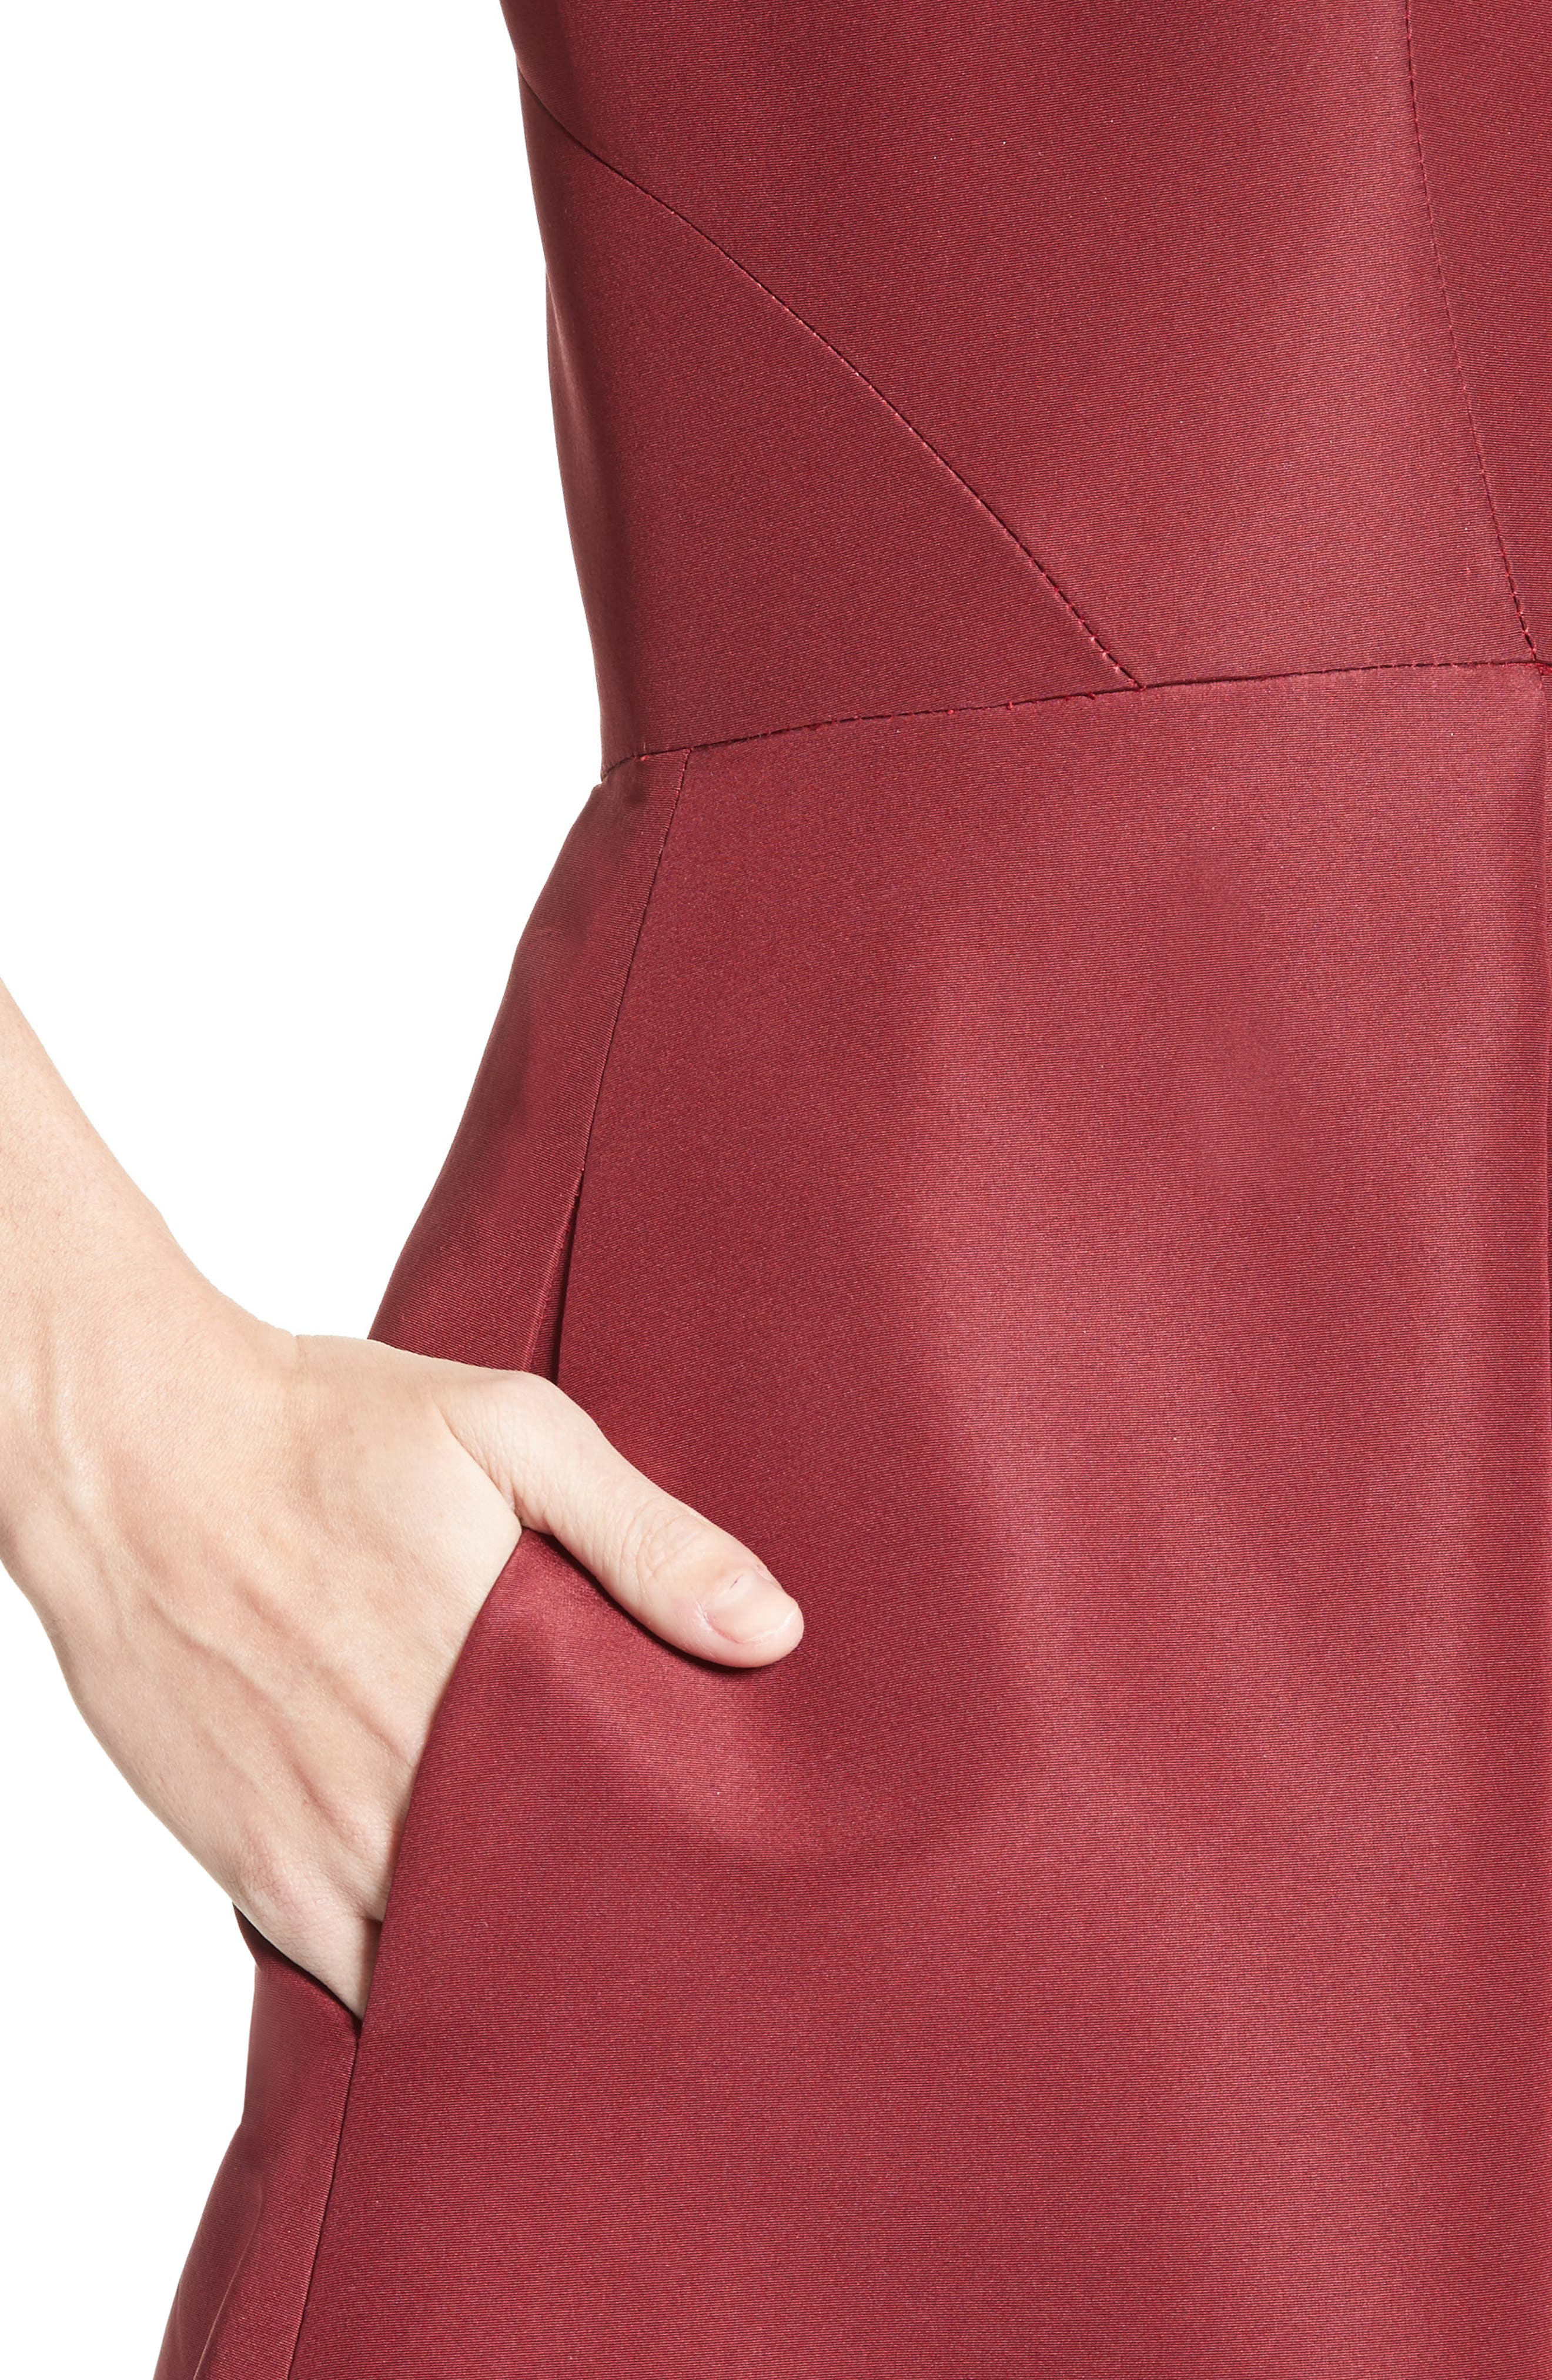 Beaded Silk Faille Gown,                             Alternate thumbnail 4, color,                             600